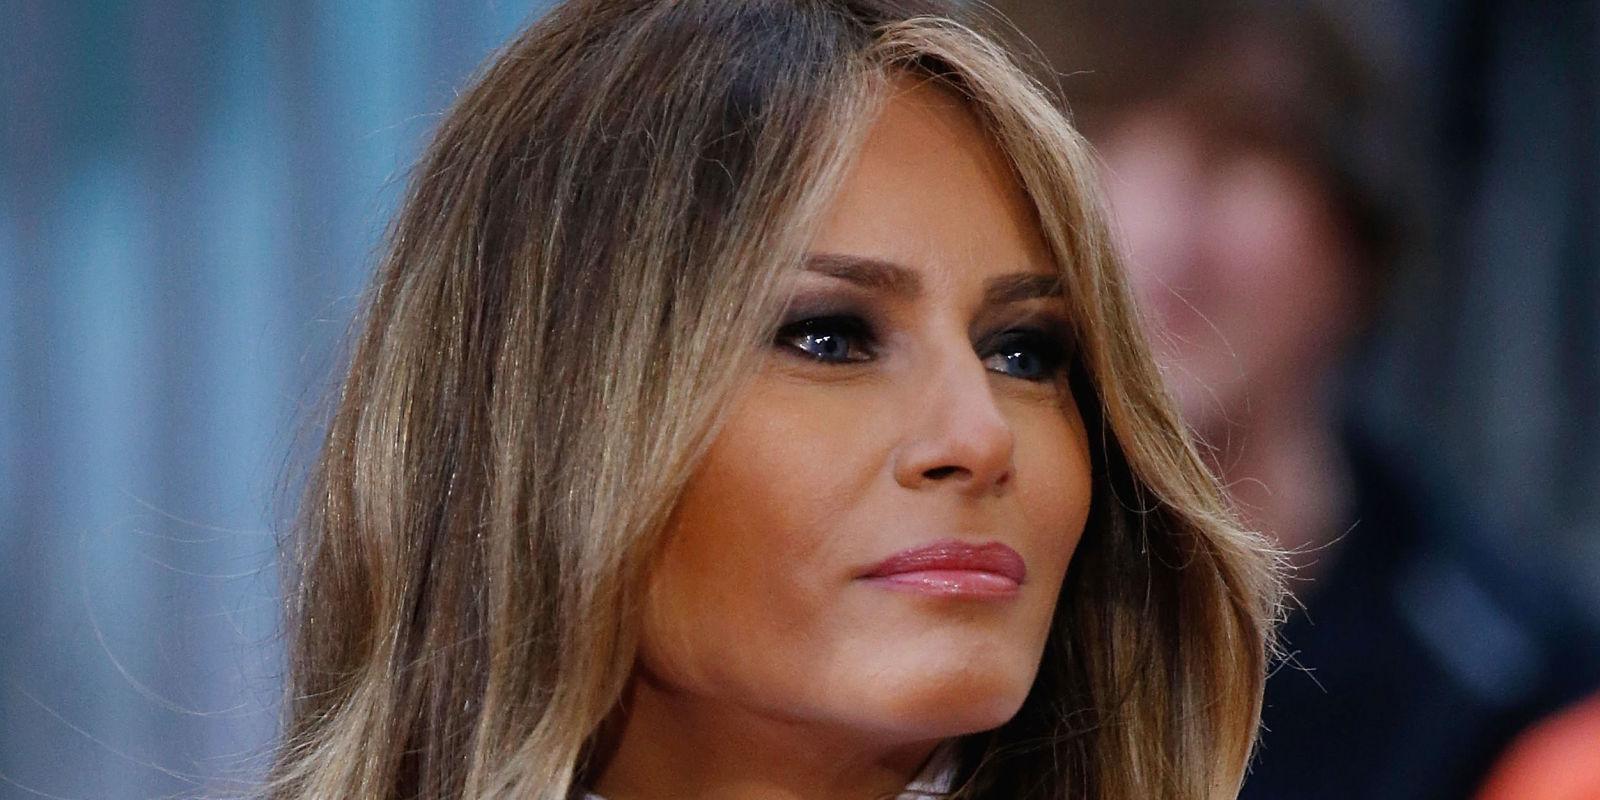 Melania  K-Nauss Trump, vuelve a estar envuelta en escándalos |Foto referencial